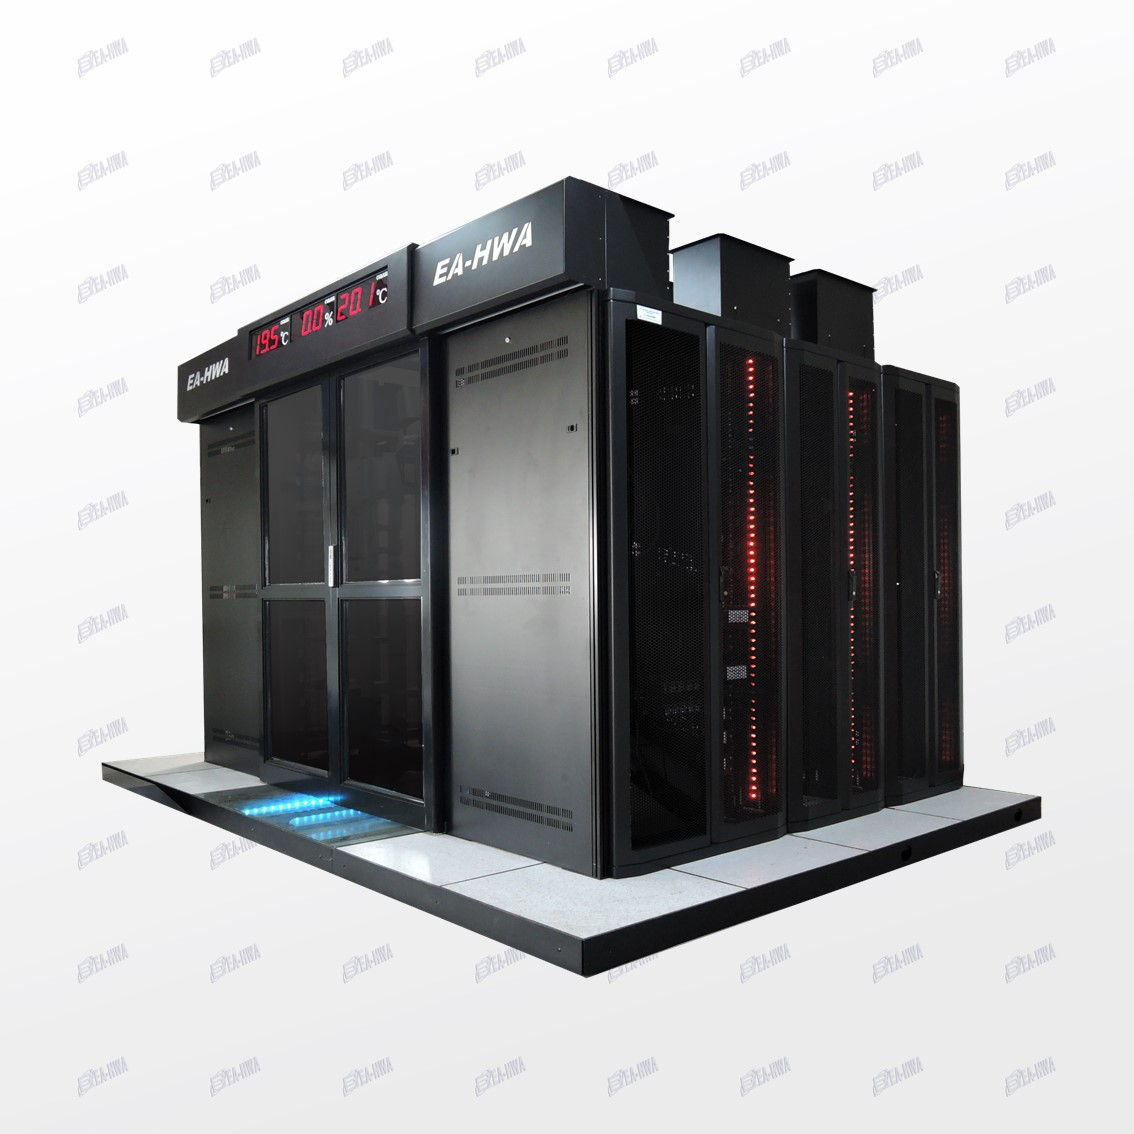 Aisle Containment Aisle Containment Systems Data Center Racks Rack